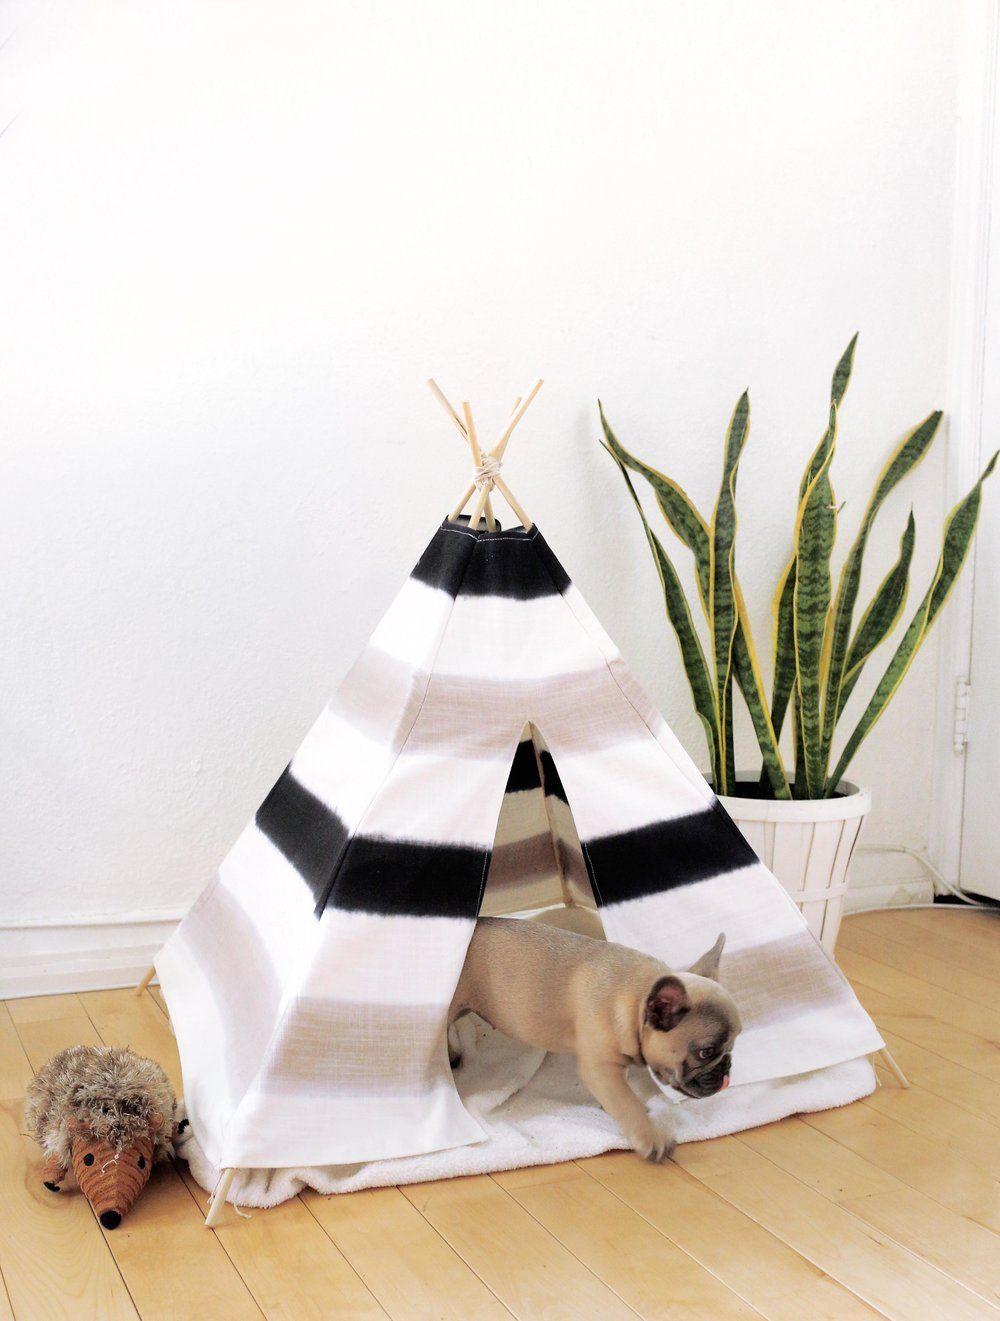 DIY PUPPY / PET TENT — The Sorry Girls -   18 diy Dog tent ideas